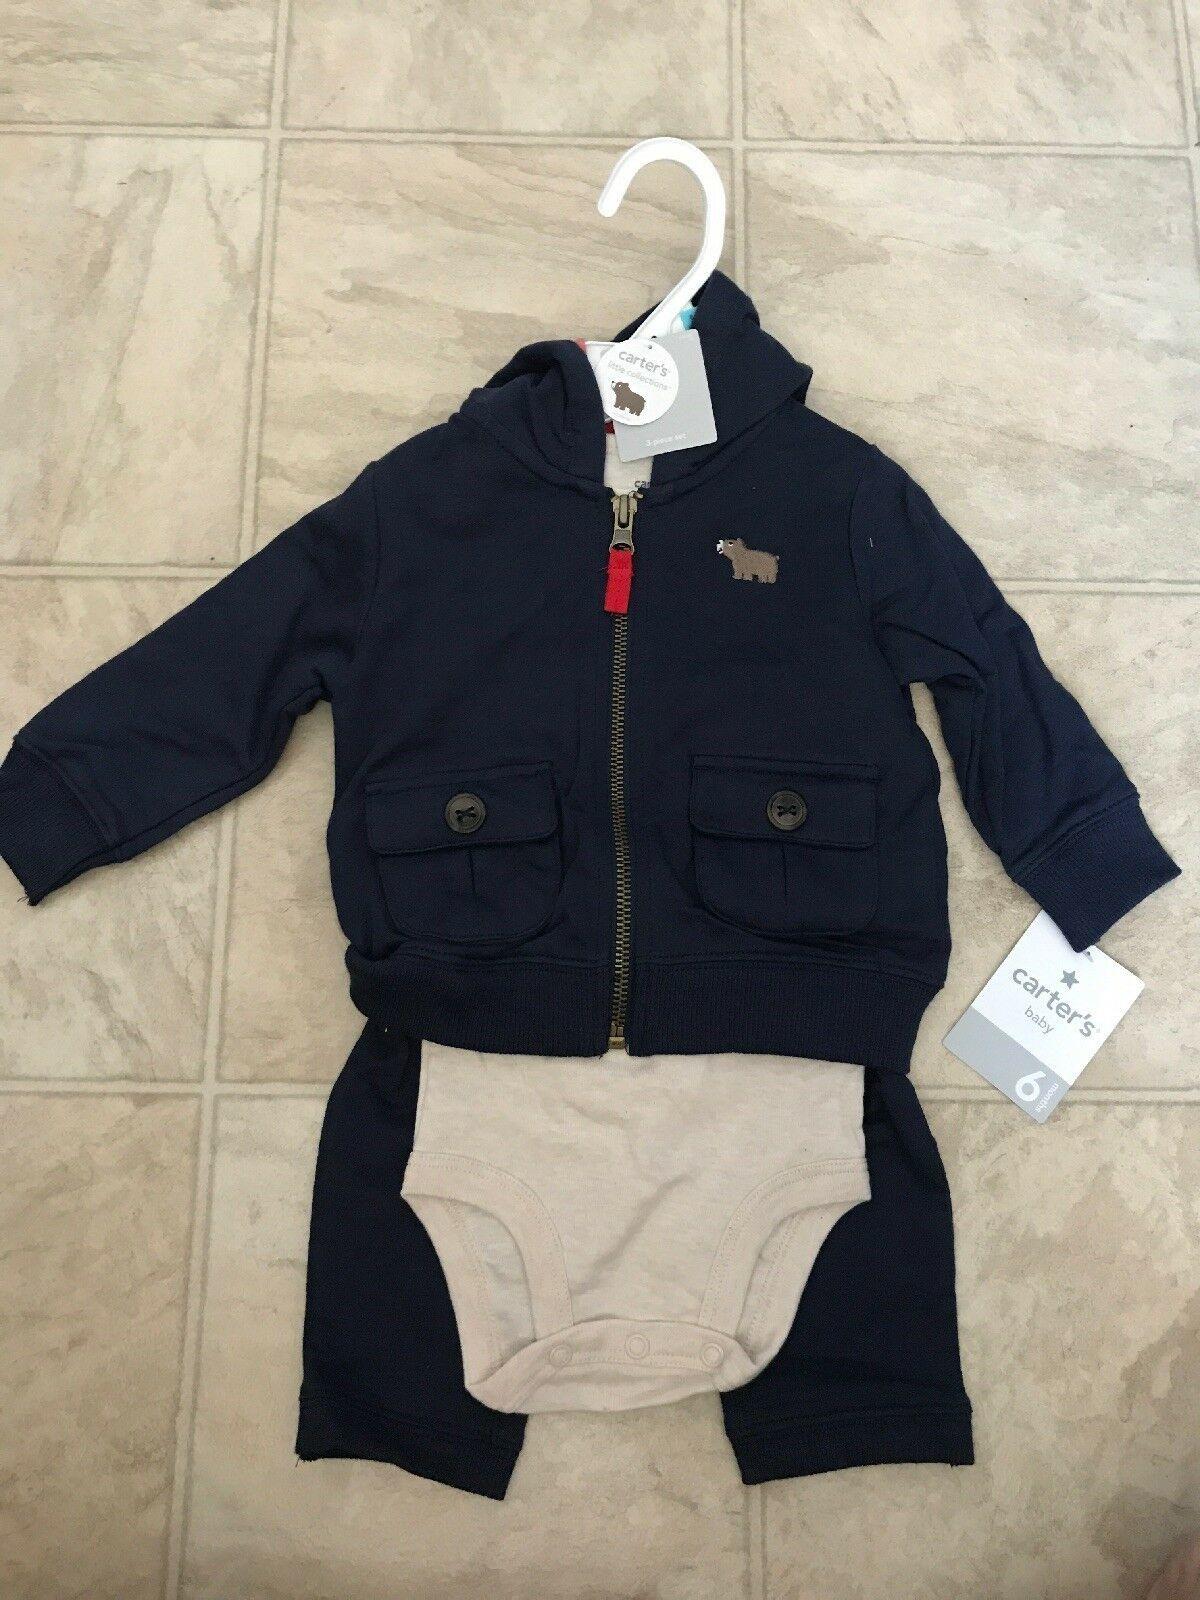 109720d66 NWT Carters Baby Boys 3 Piece Long Sleeve and 12 similar items. S l1600